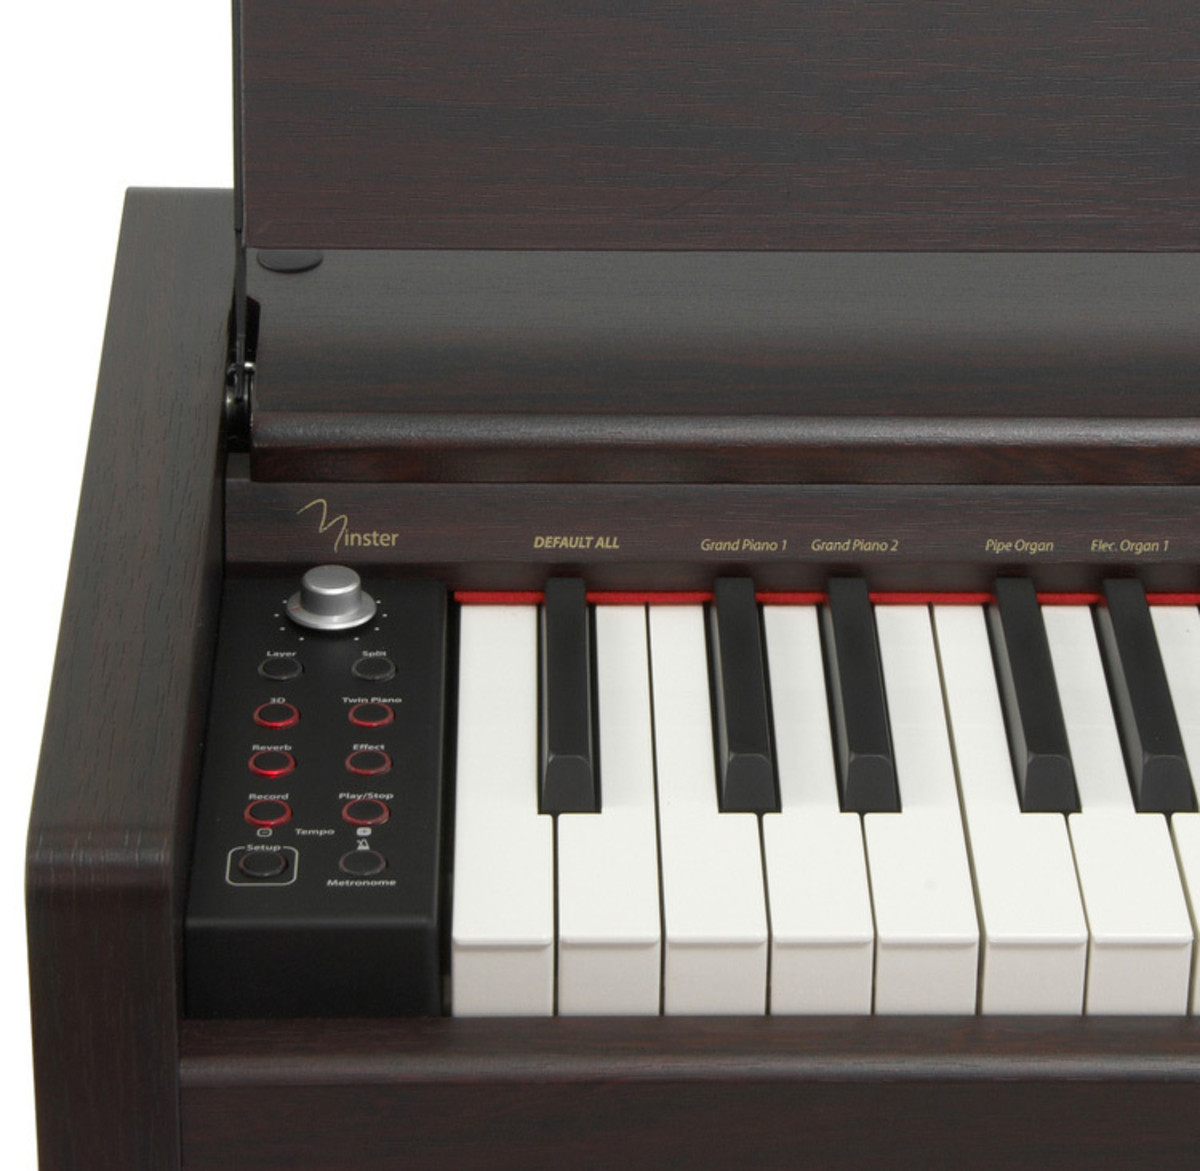 cath drale mlp300 compact piano num rique palissandre d 39 occasion comme neuf. Black Bedroom Furniture Sets. Home Design Ideas